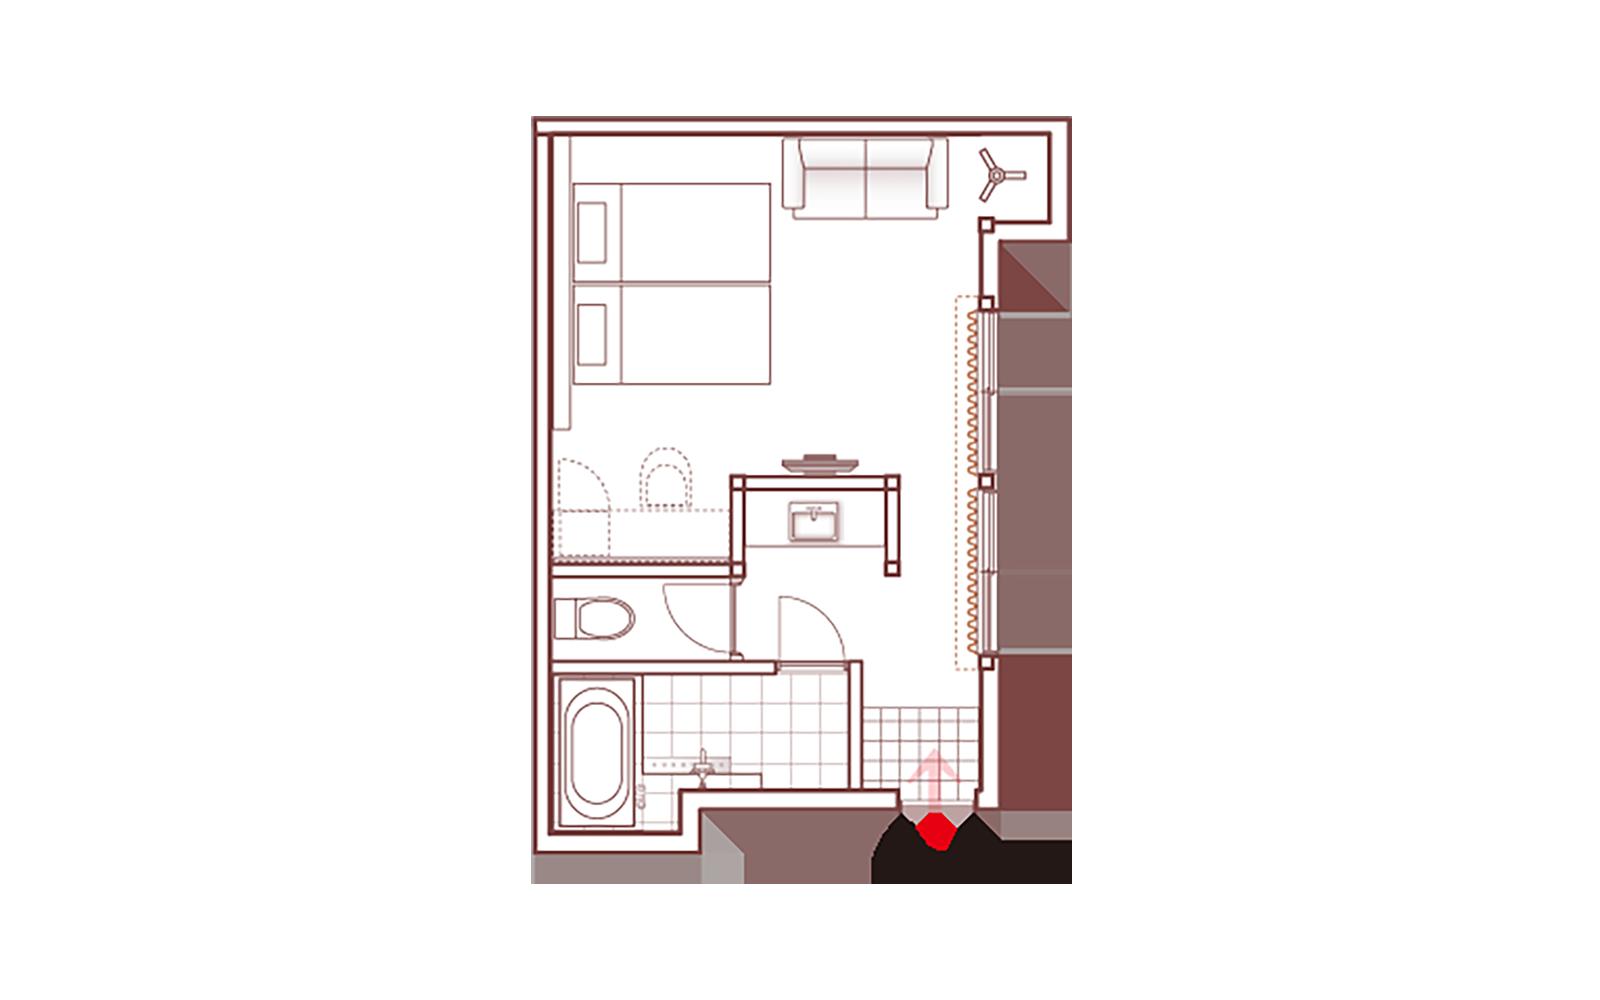 room206_drawing